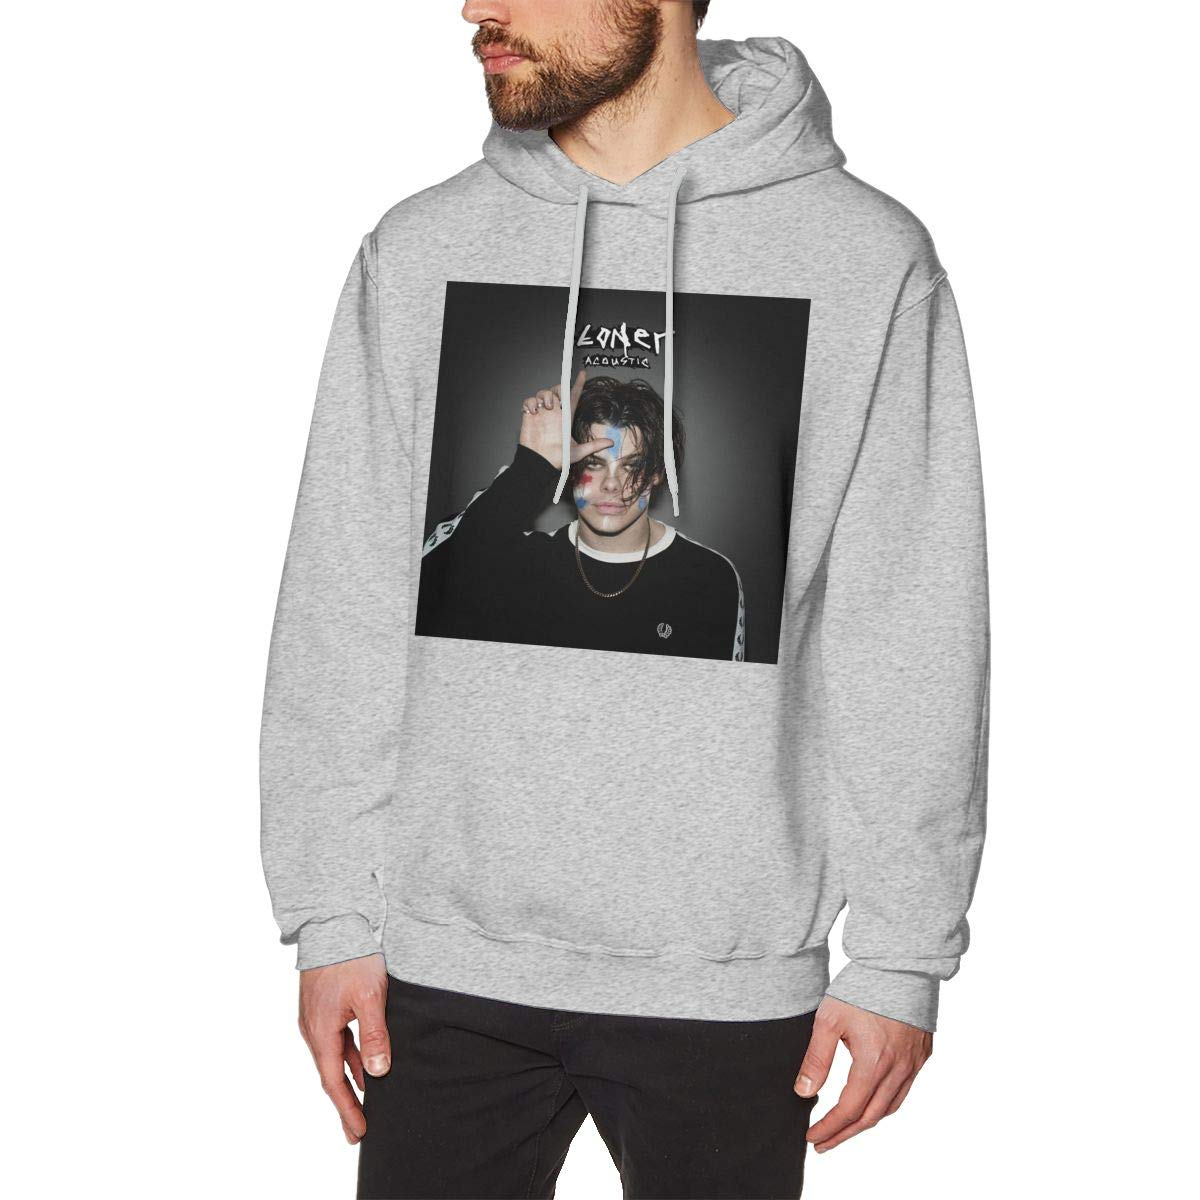 Hazelknorton Graphic Yungblud Mens Cotton Graphic Hoody Gray Long Sleeve Sweatshirt